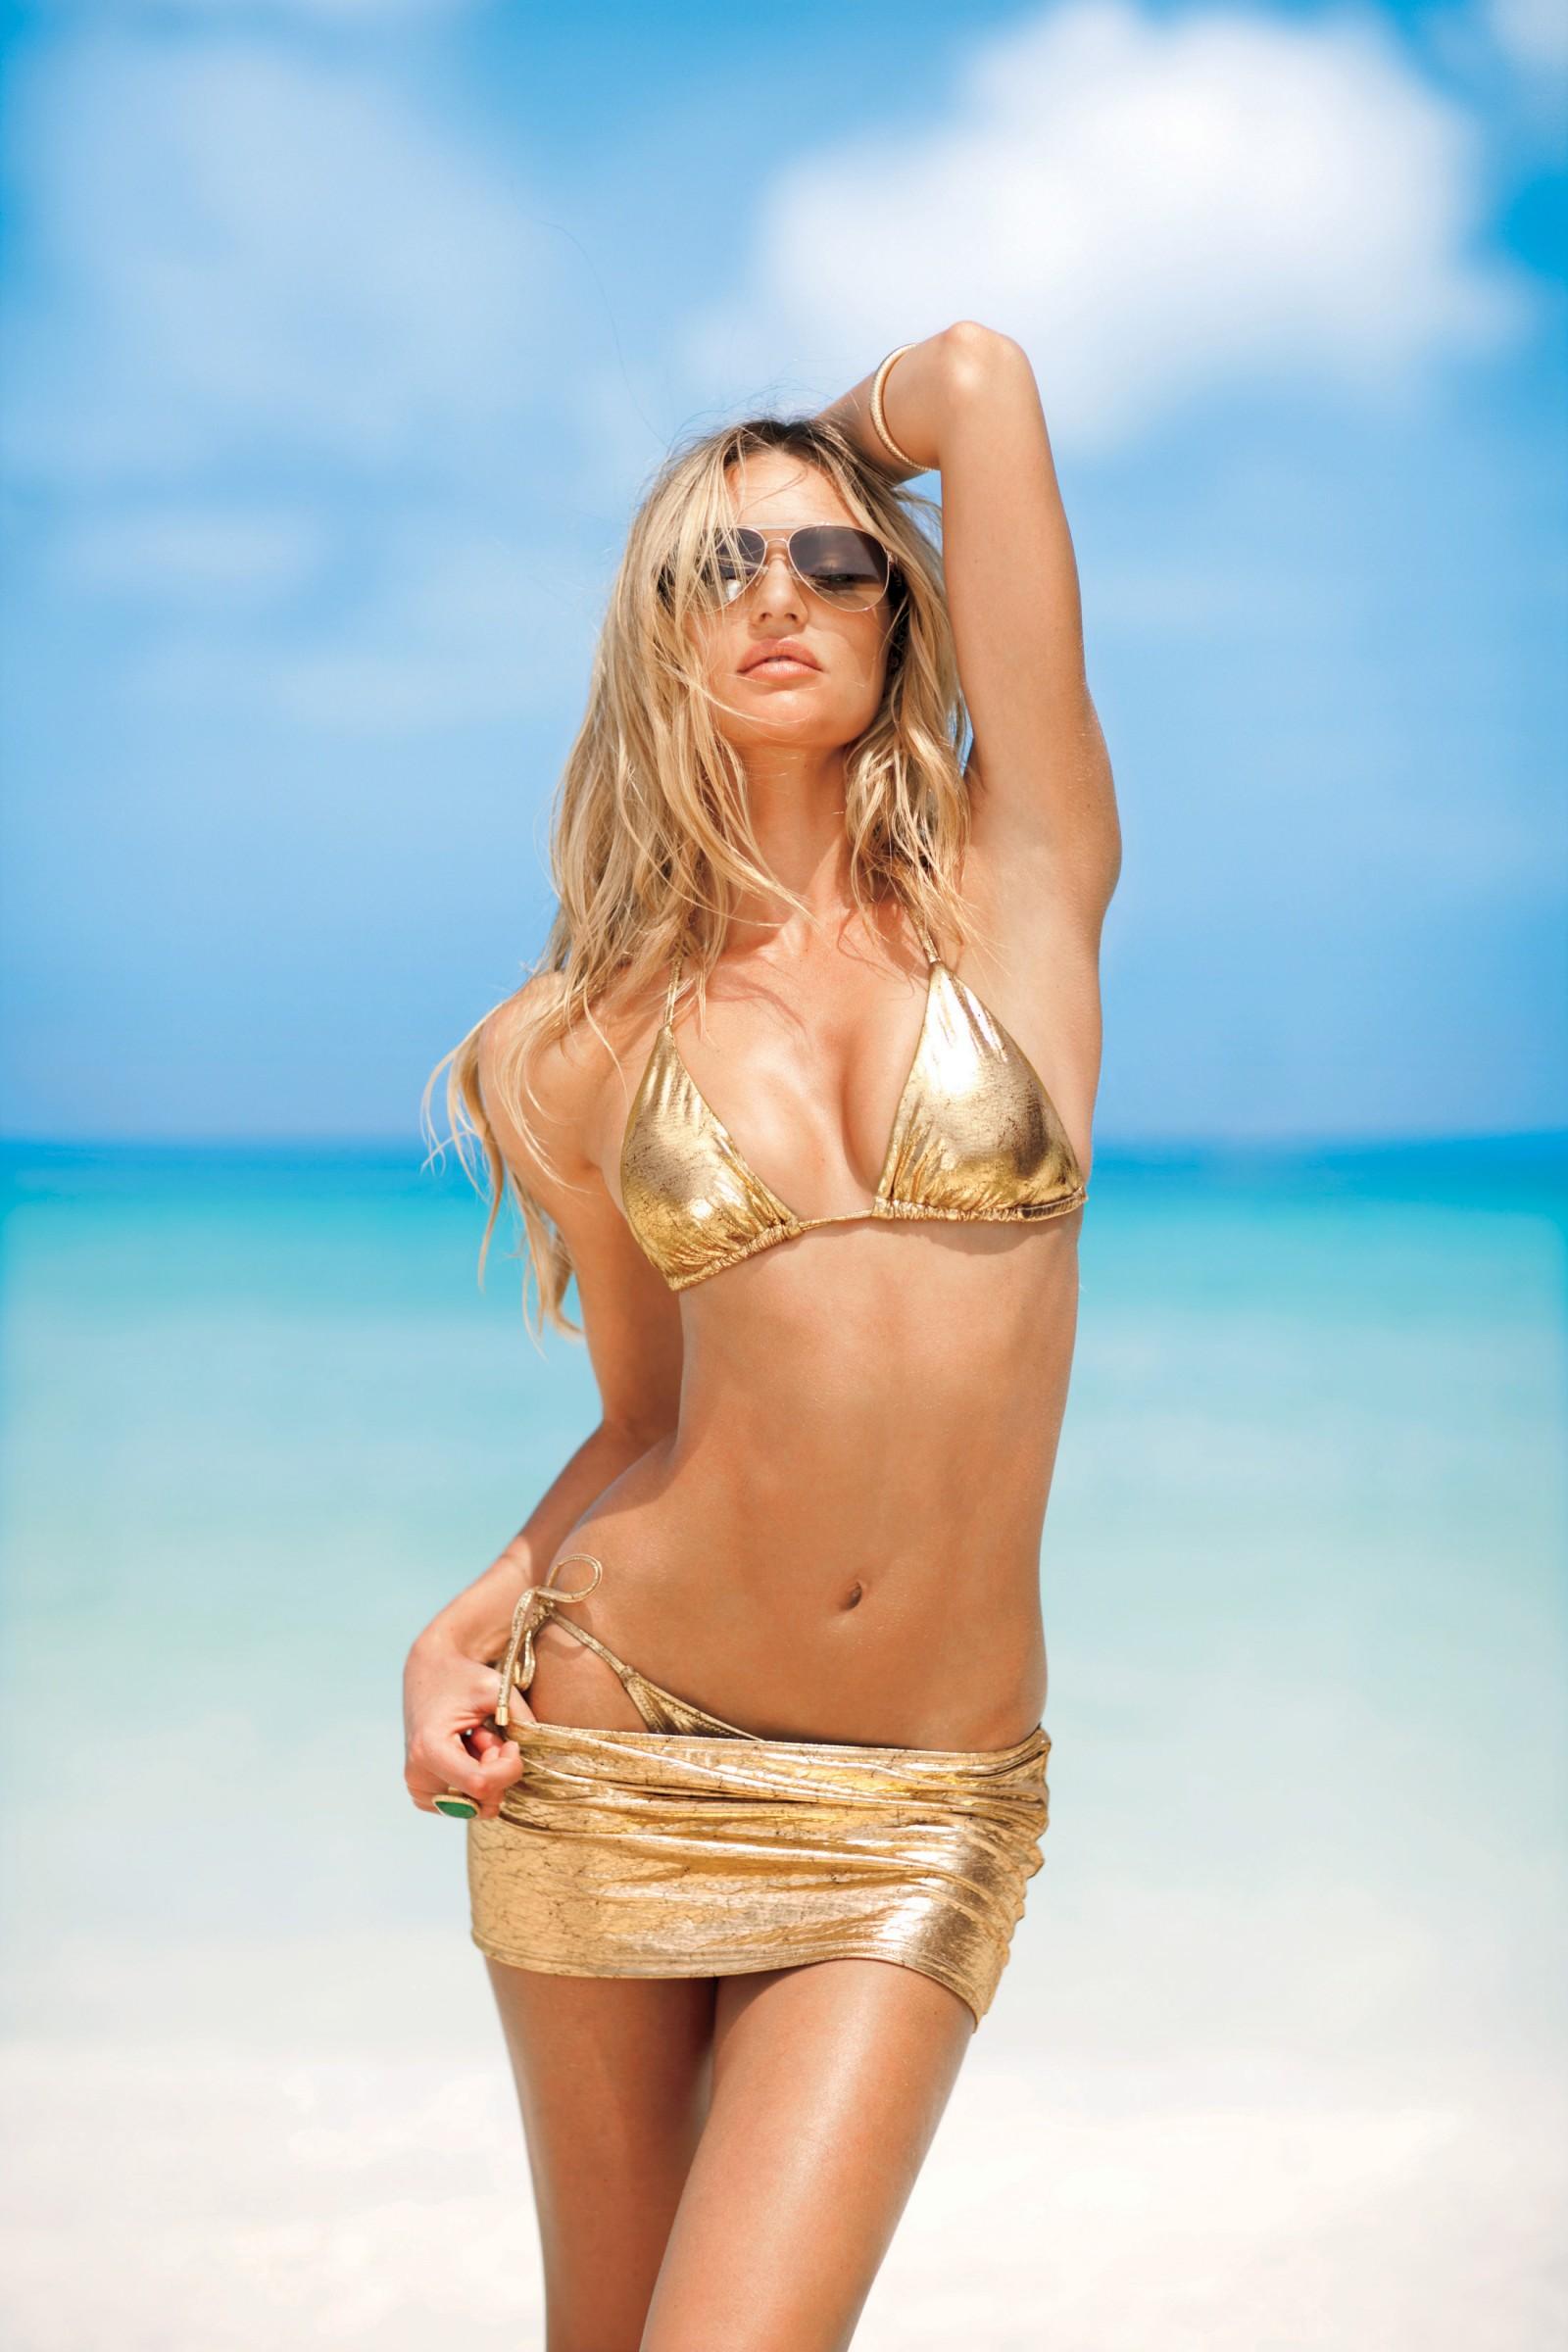 hardcore anal penetration for the blonde in golden bikini  376420